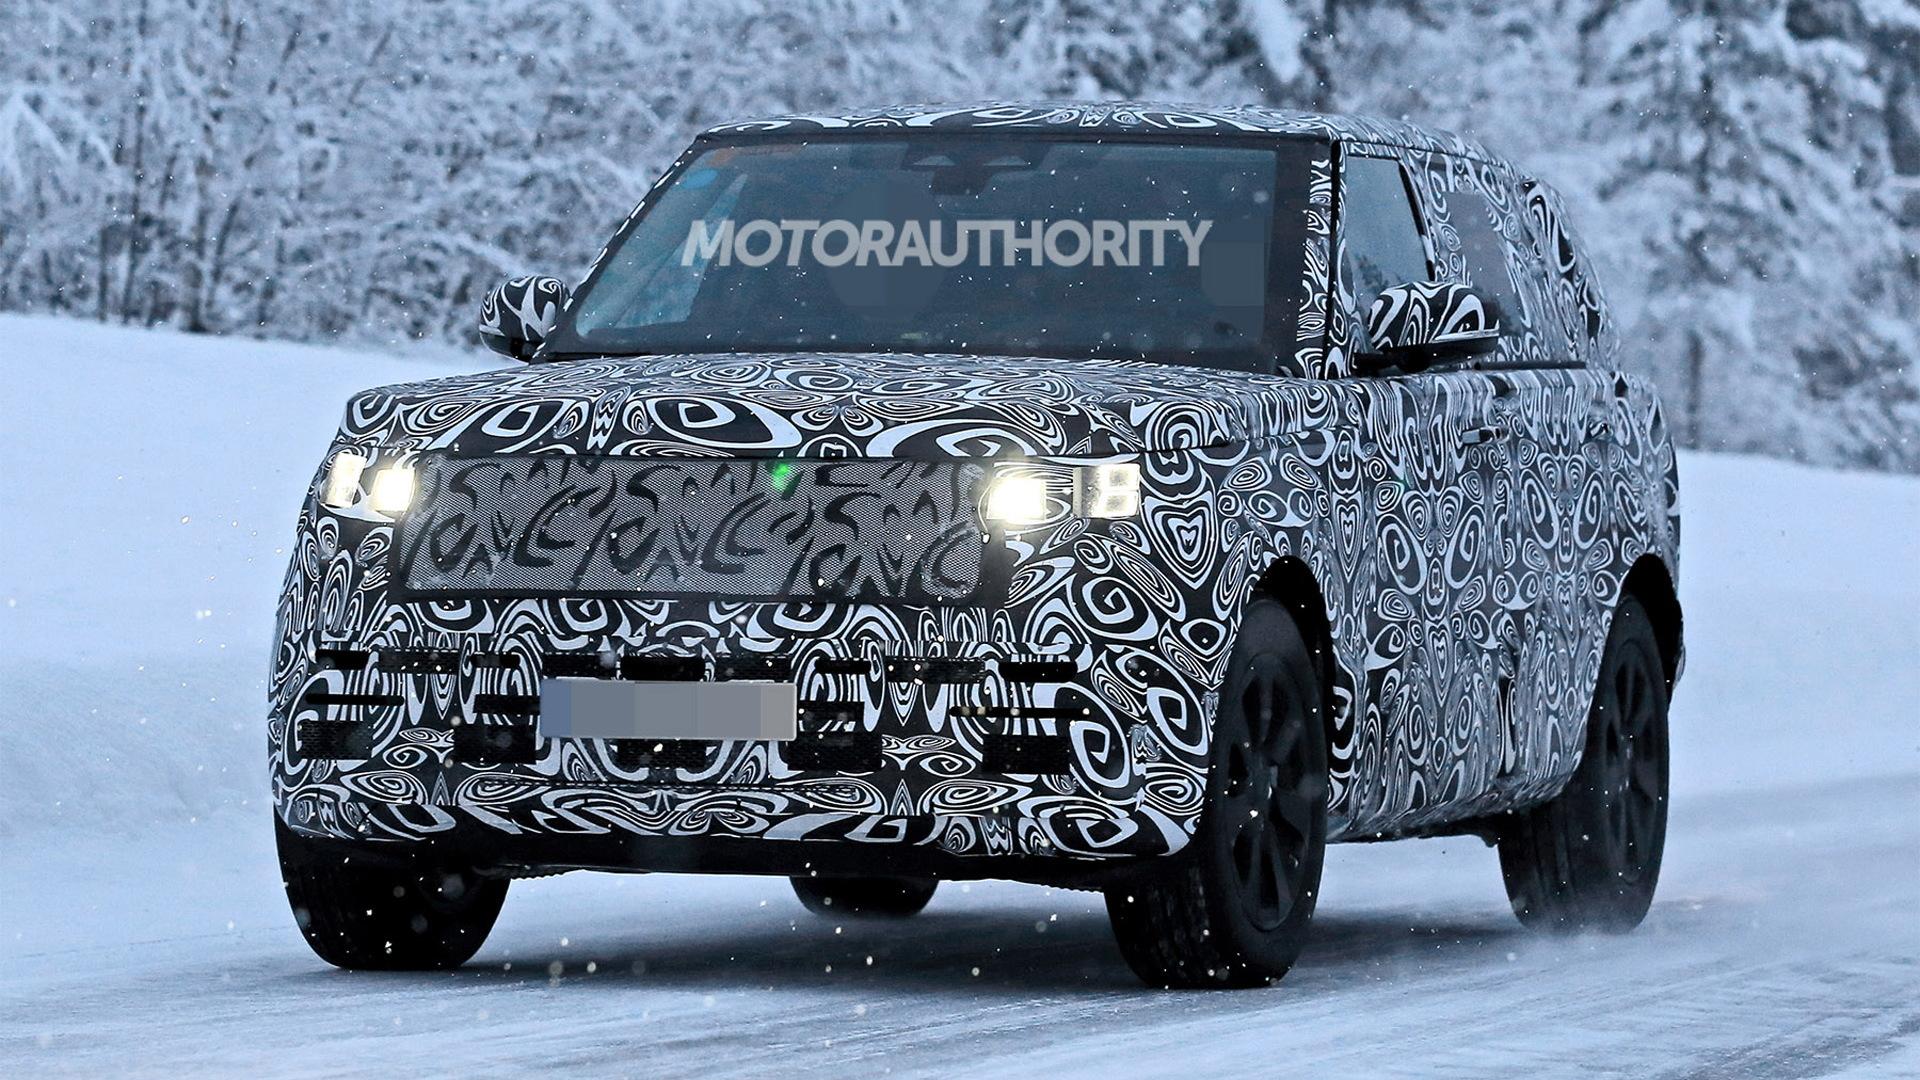 2022 Land Rover Range Rover Long Wheelbase spy shots - Photo credit: S. Baldauf/SB-Medien